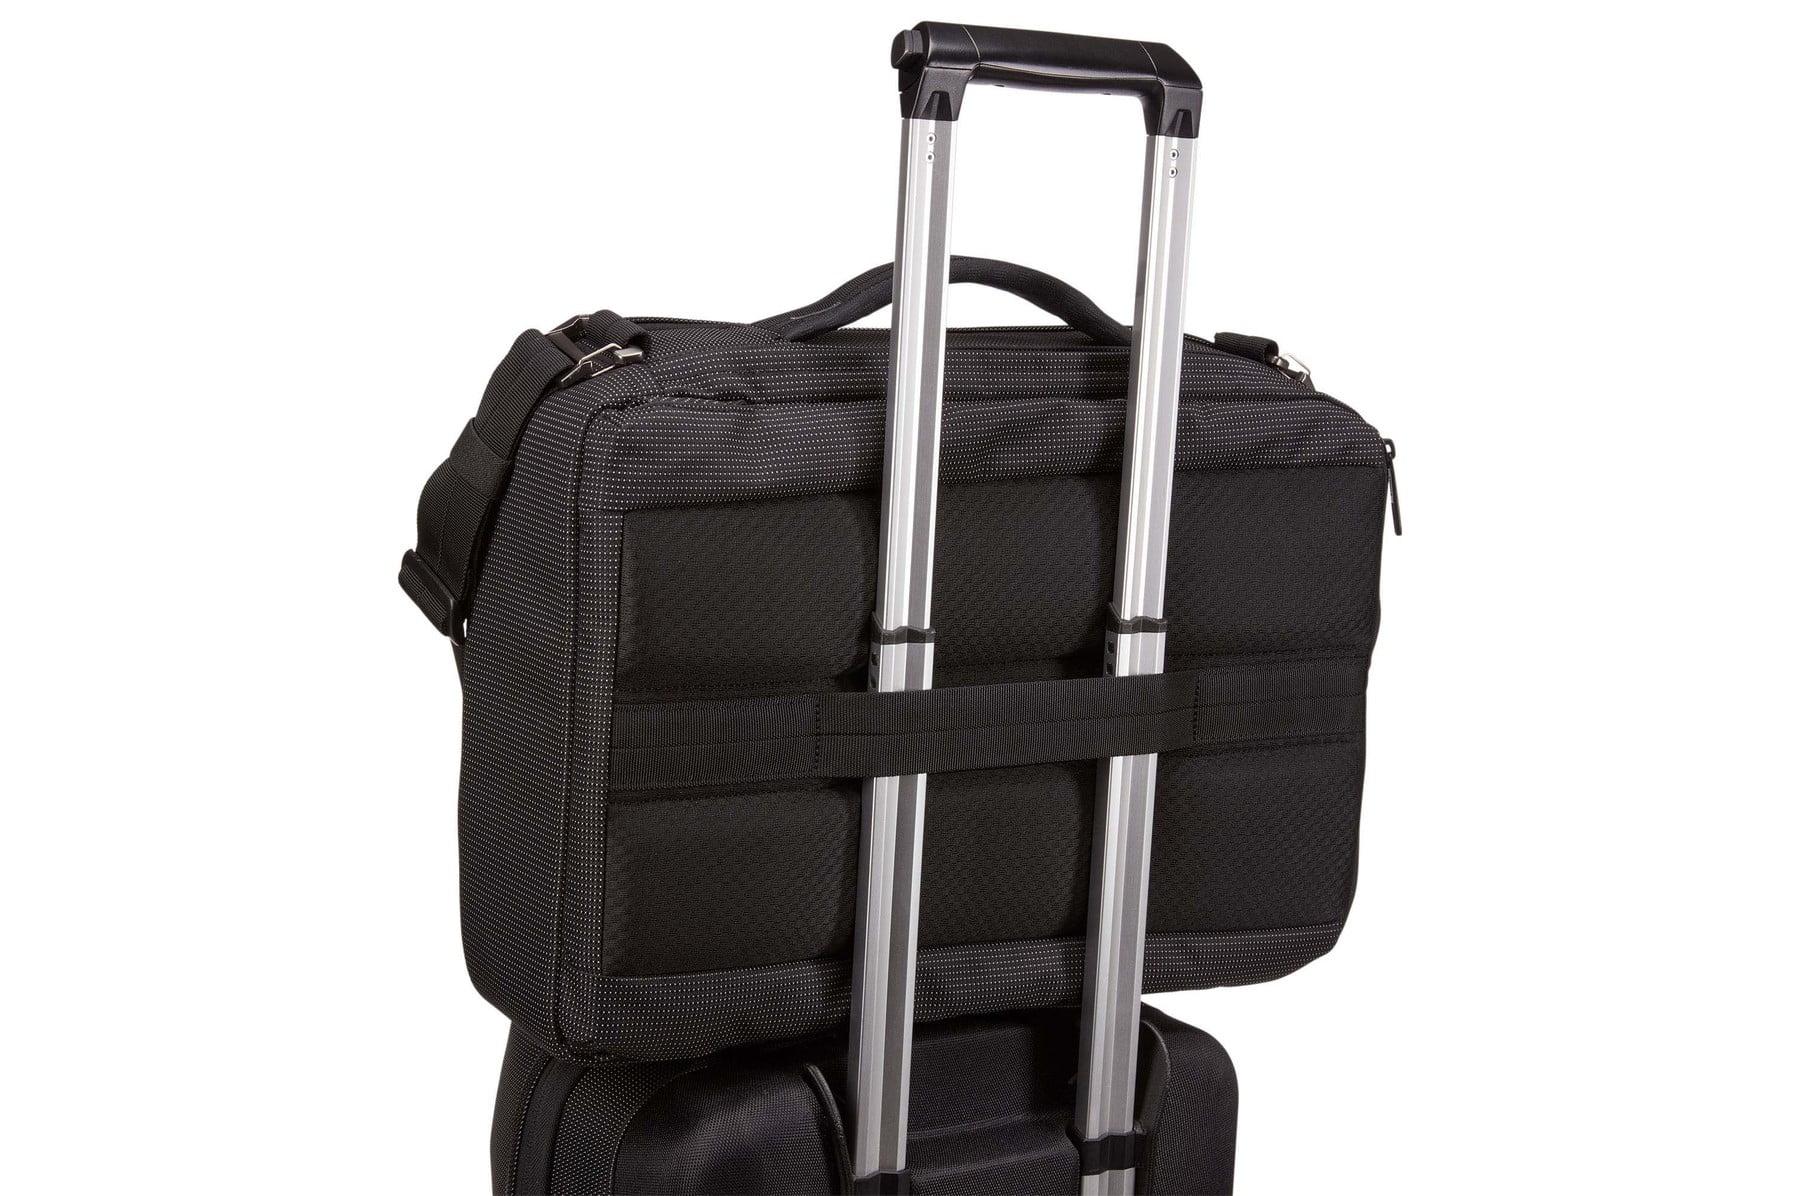 Geanta laptop Thule Crossover 2 Convertible Laptop Bag 15.6 inchi Black 3